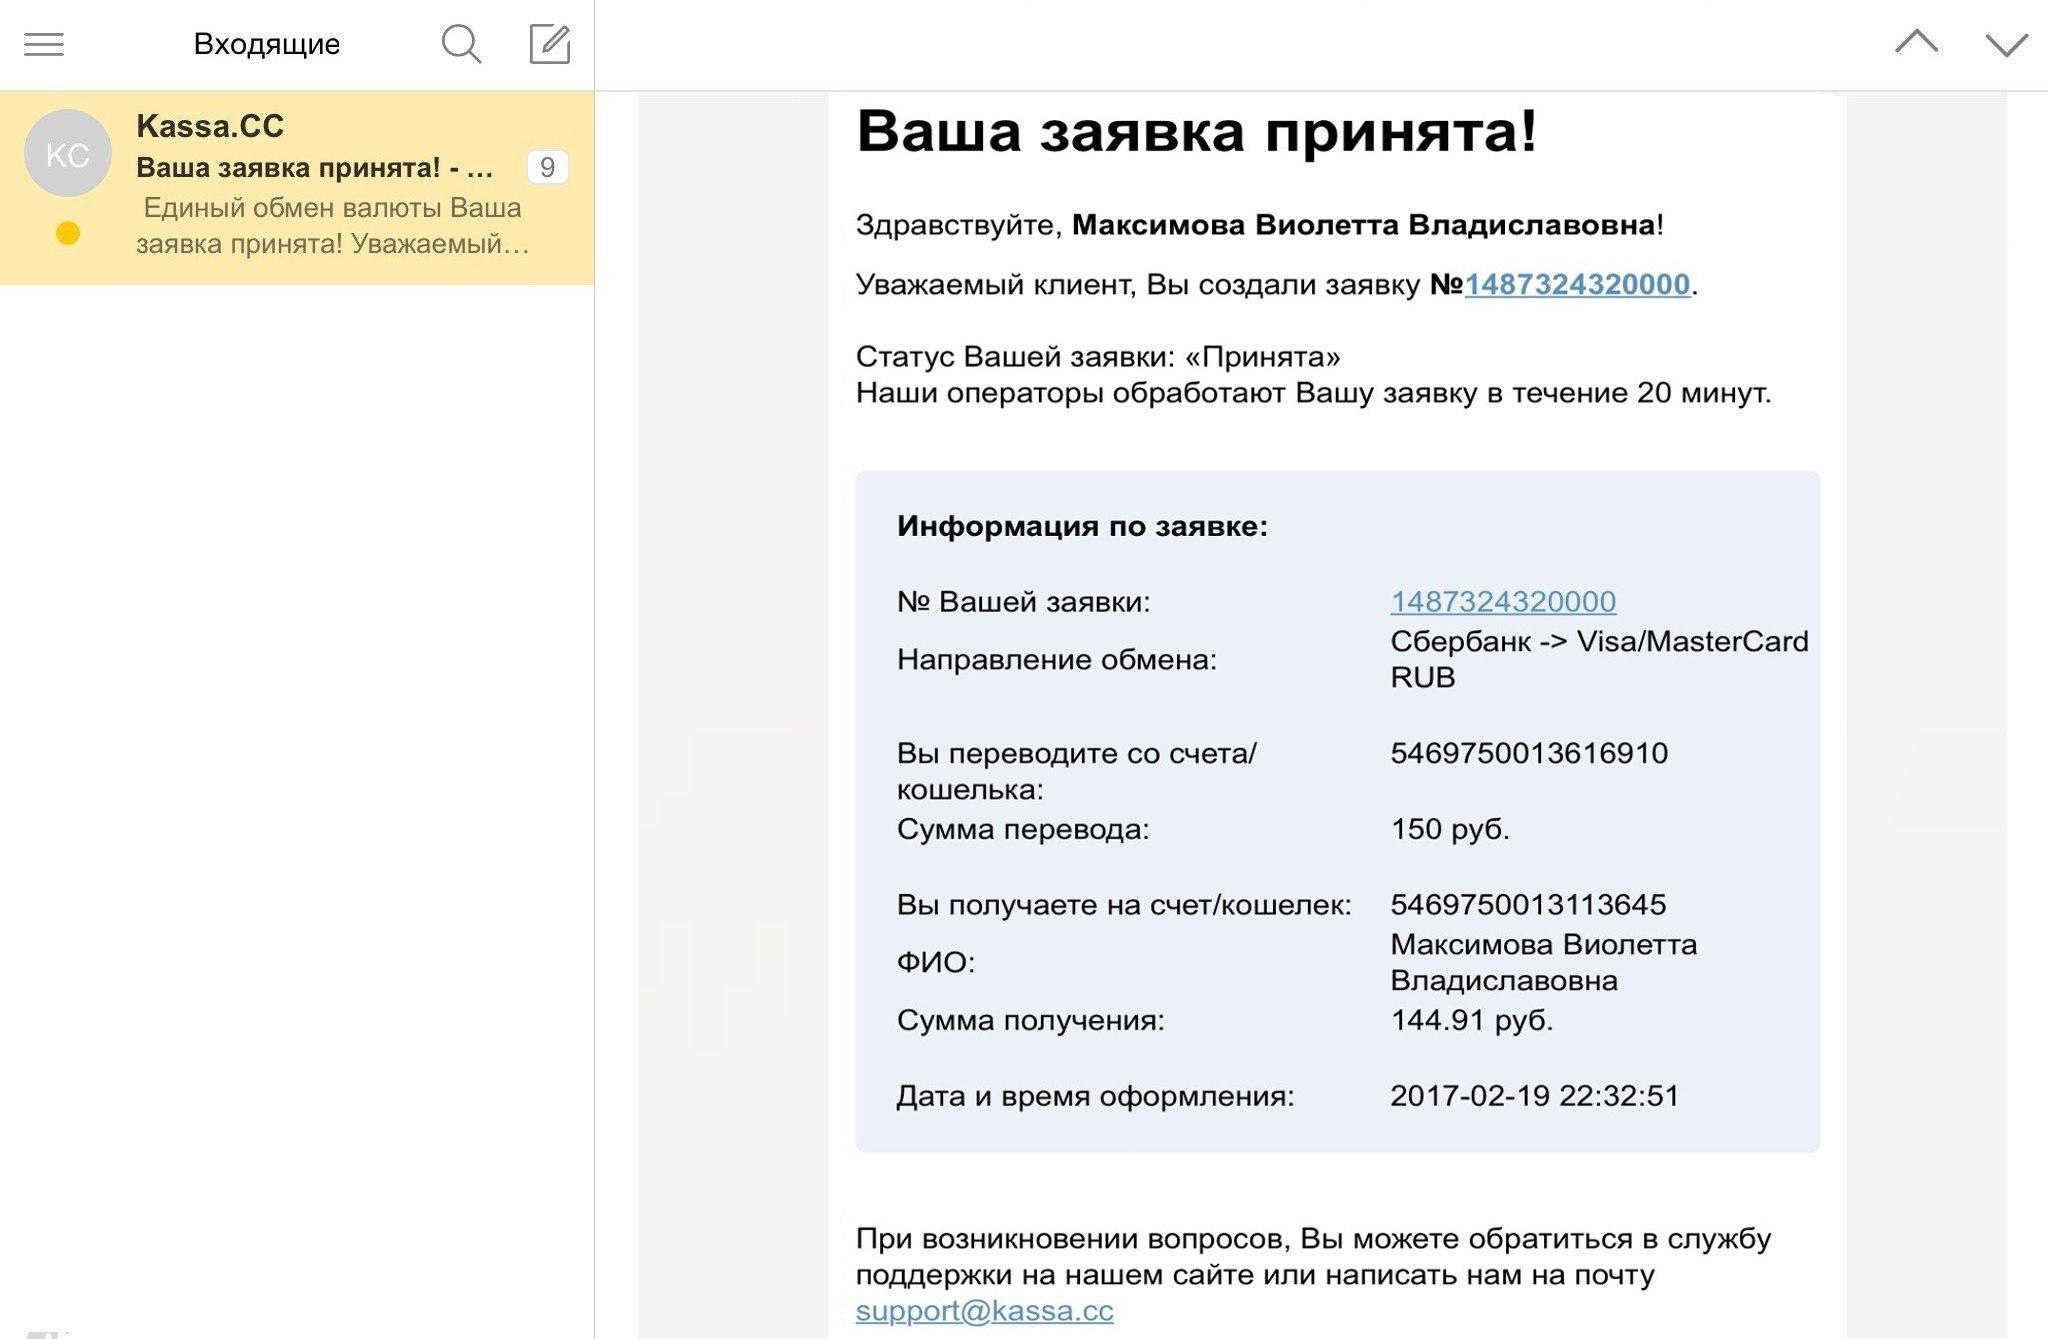 Kassa.cc - единый обмен валюты. Обмен Сбербанк на Visa/MasterCard RUB